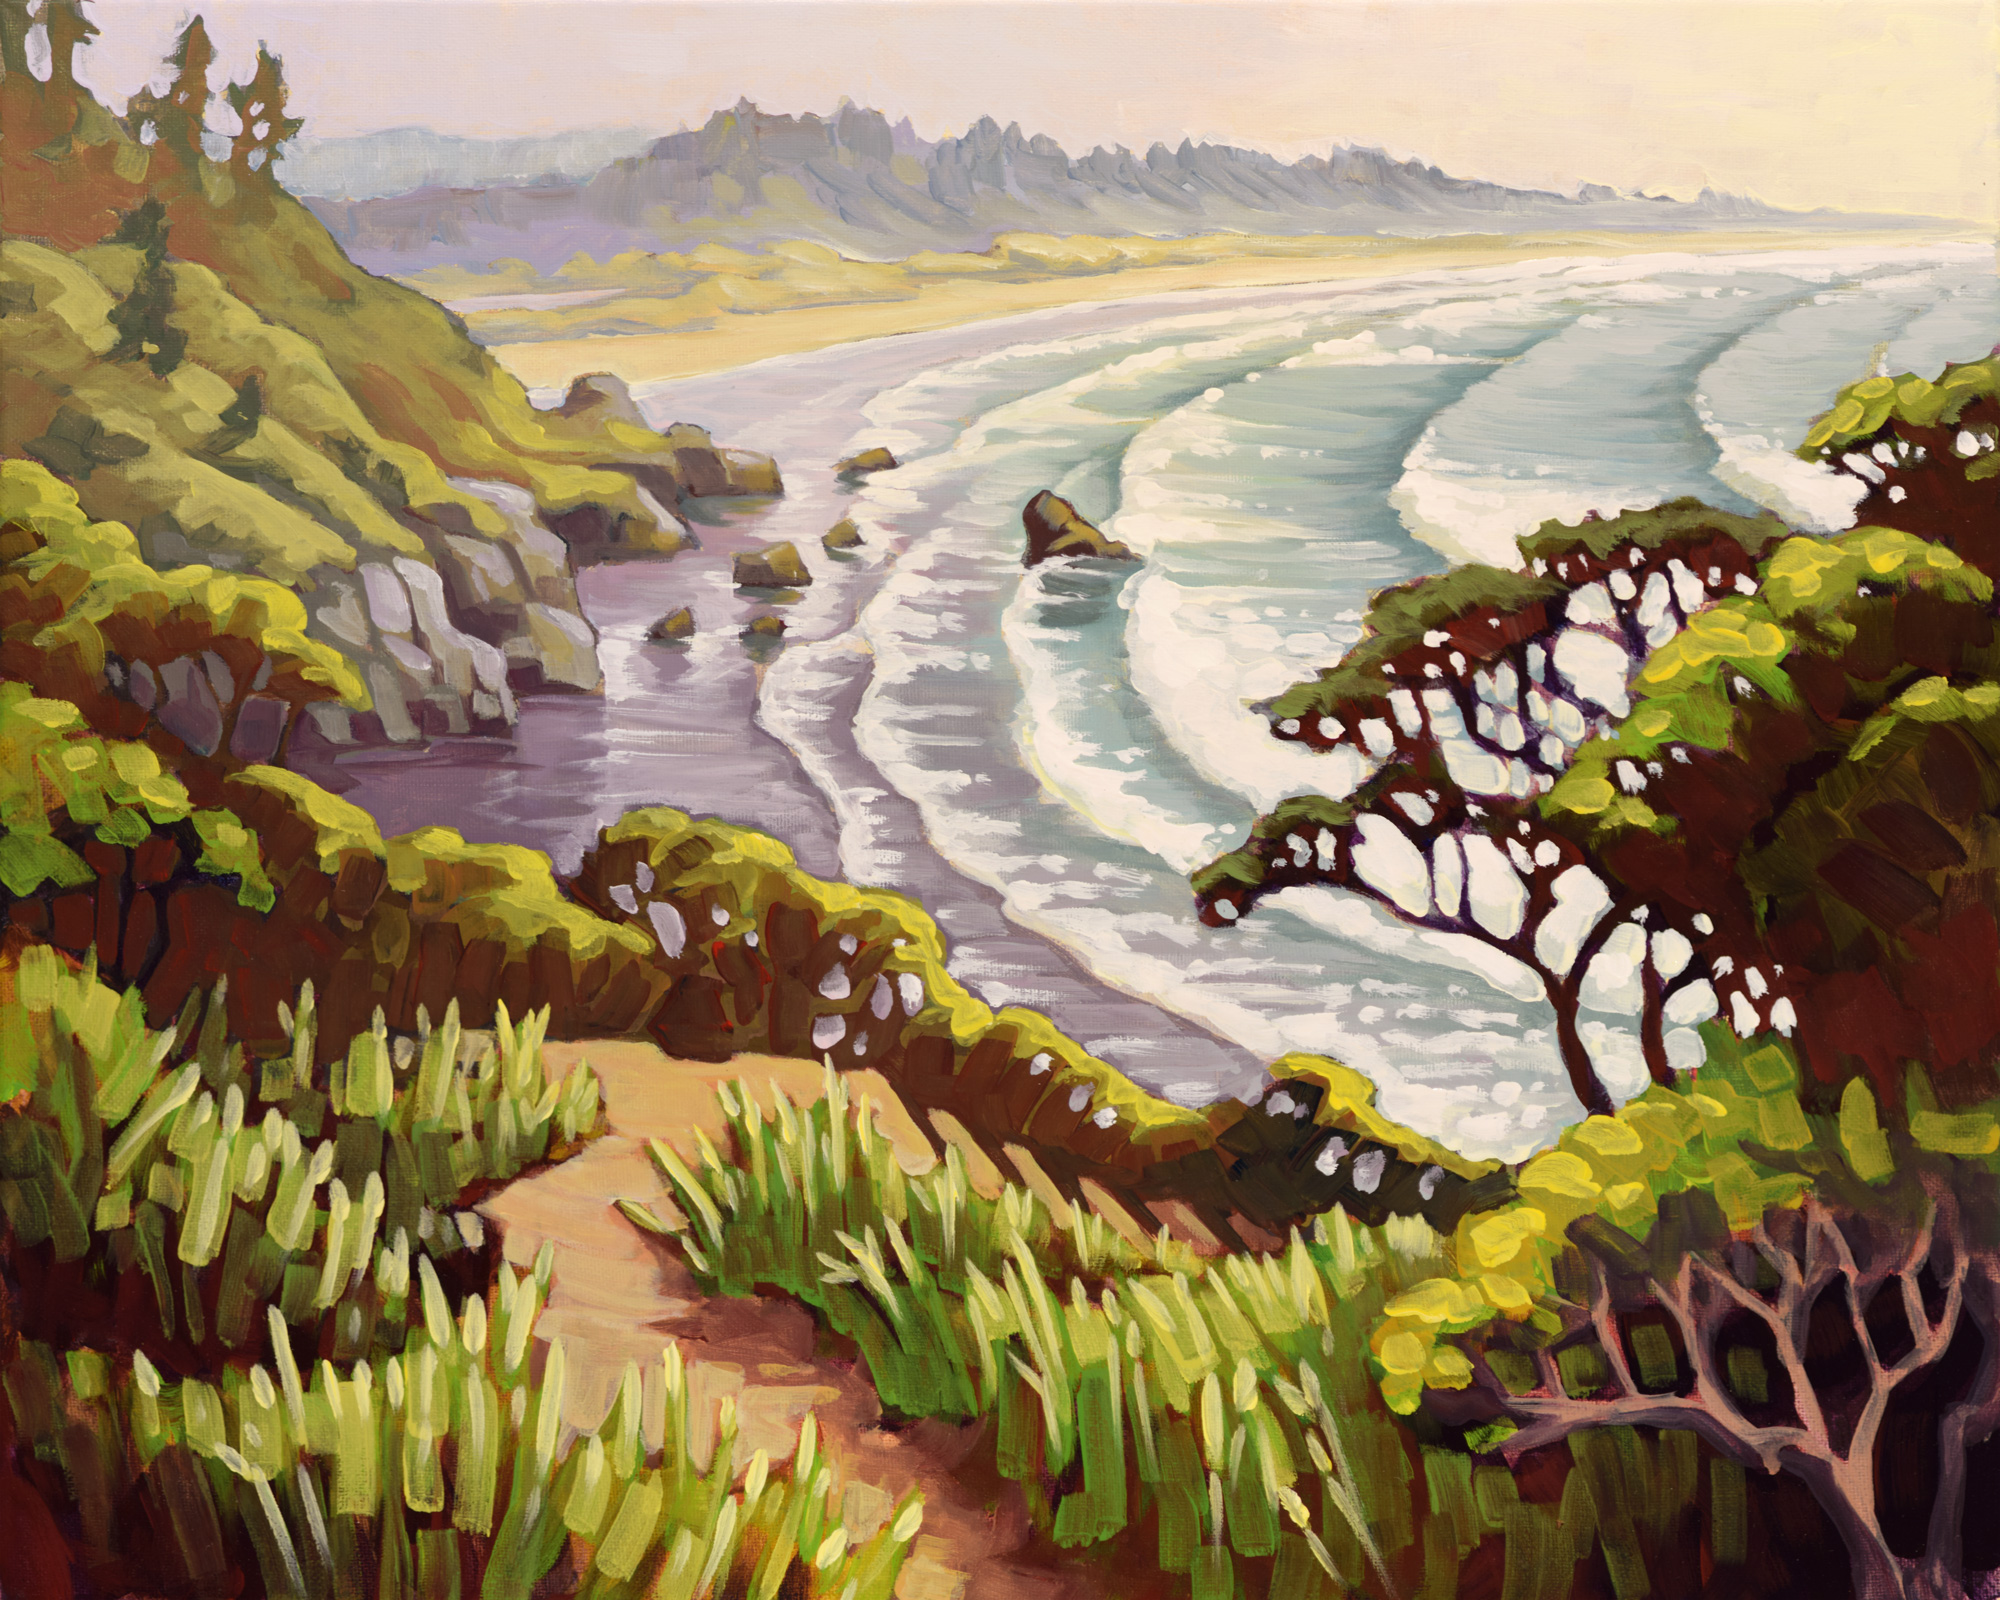 Plein air artwork from Houda Point looking toward Moonstone Beach on the Humboldt coast of Northern California